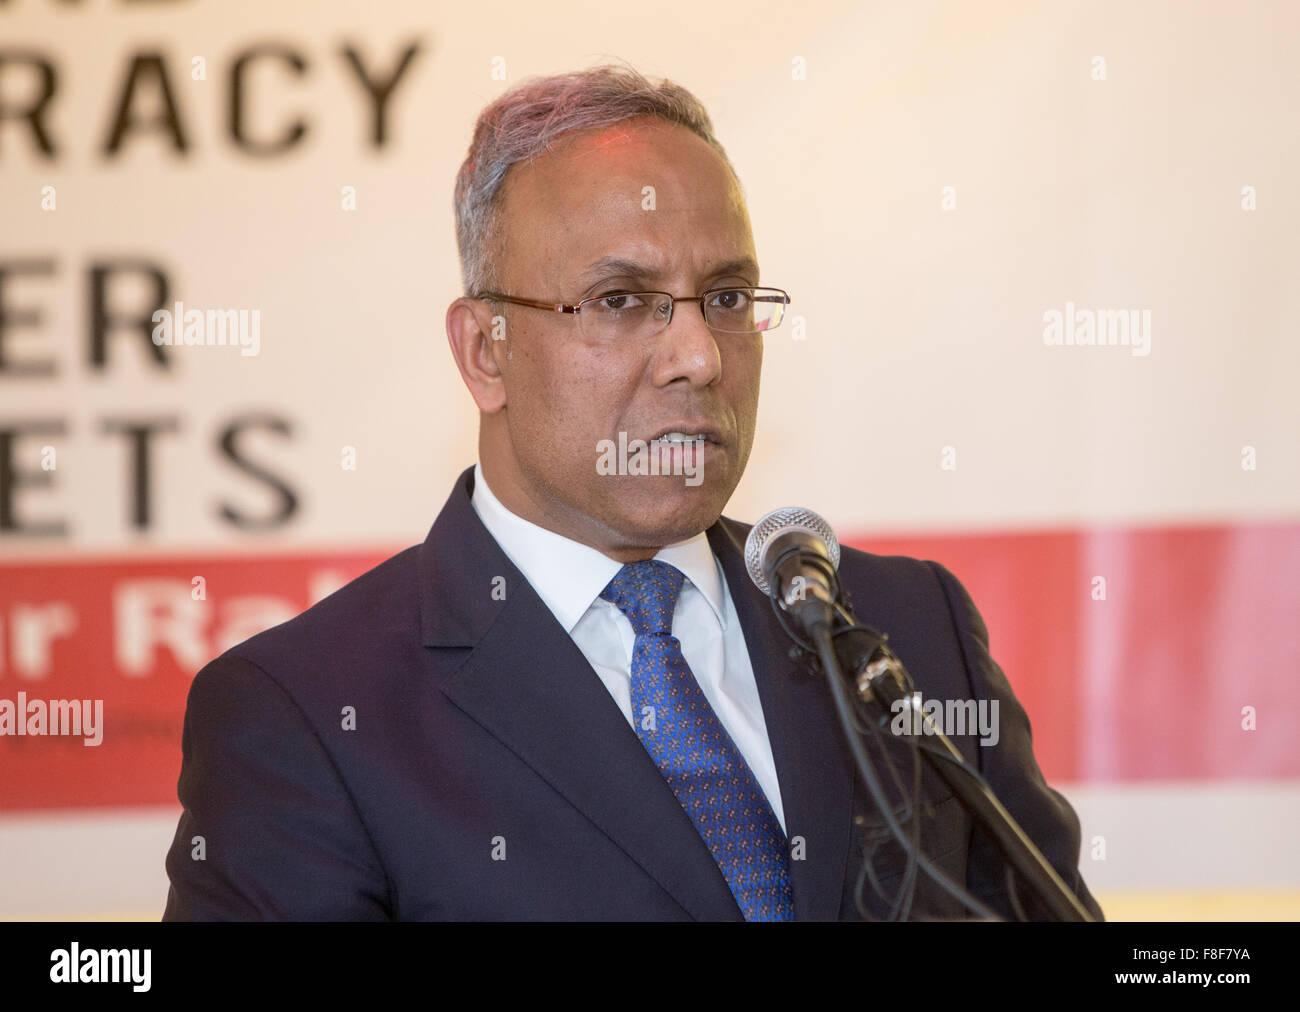 Lutfur Rahman,former Mayor of Tower Hamlets,speaks at an event in Whitechapel - Stock Image